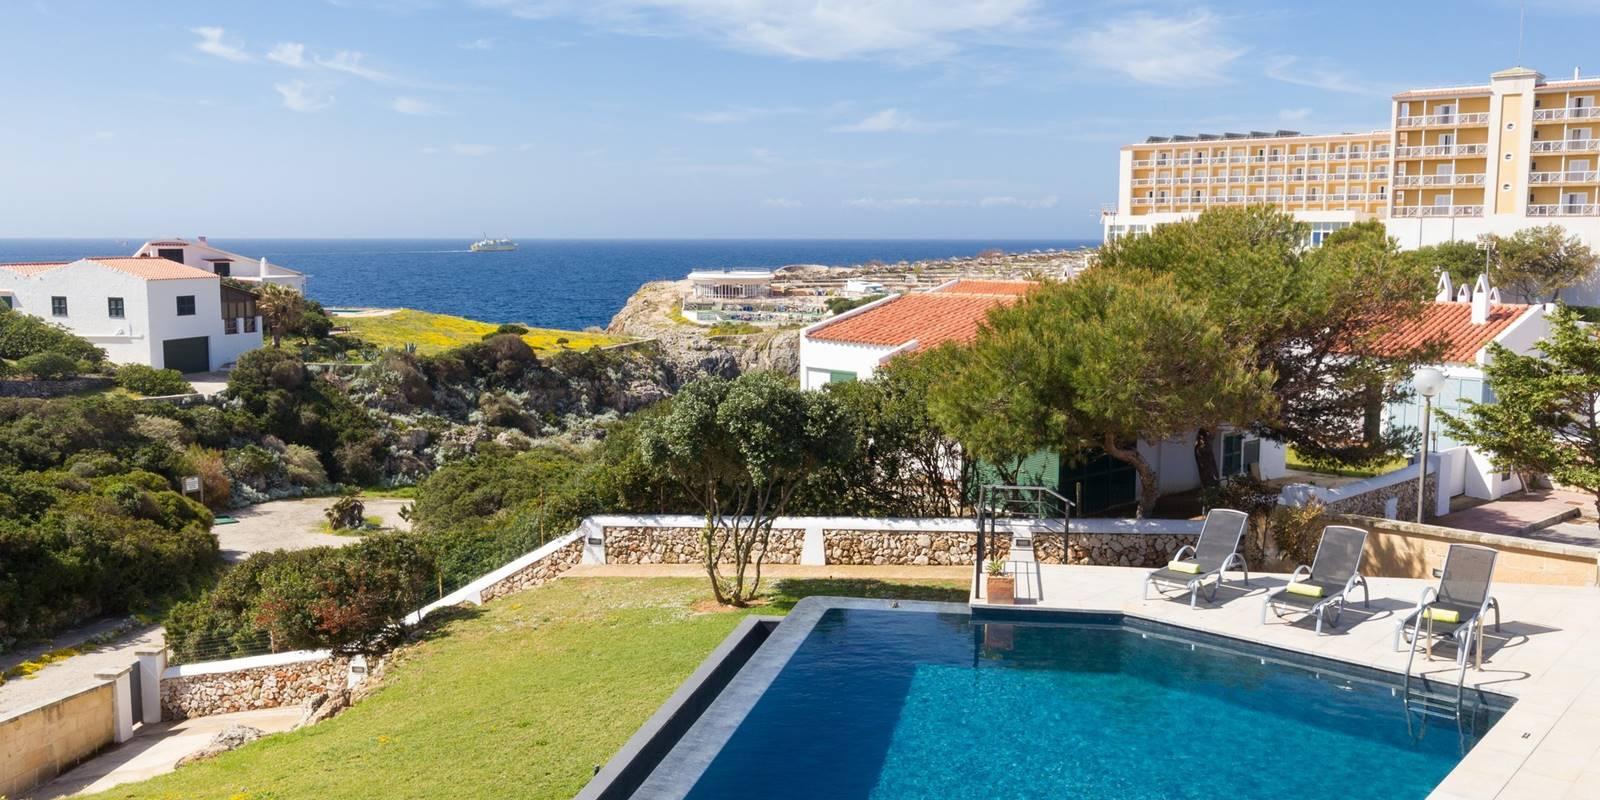 Villas To Rent In Cala Morell Menorca